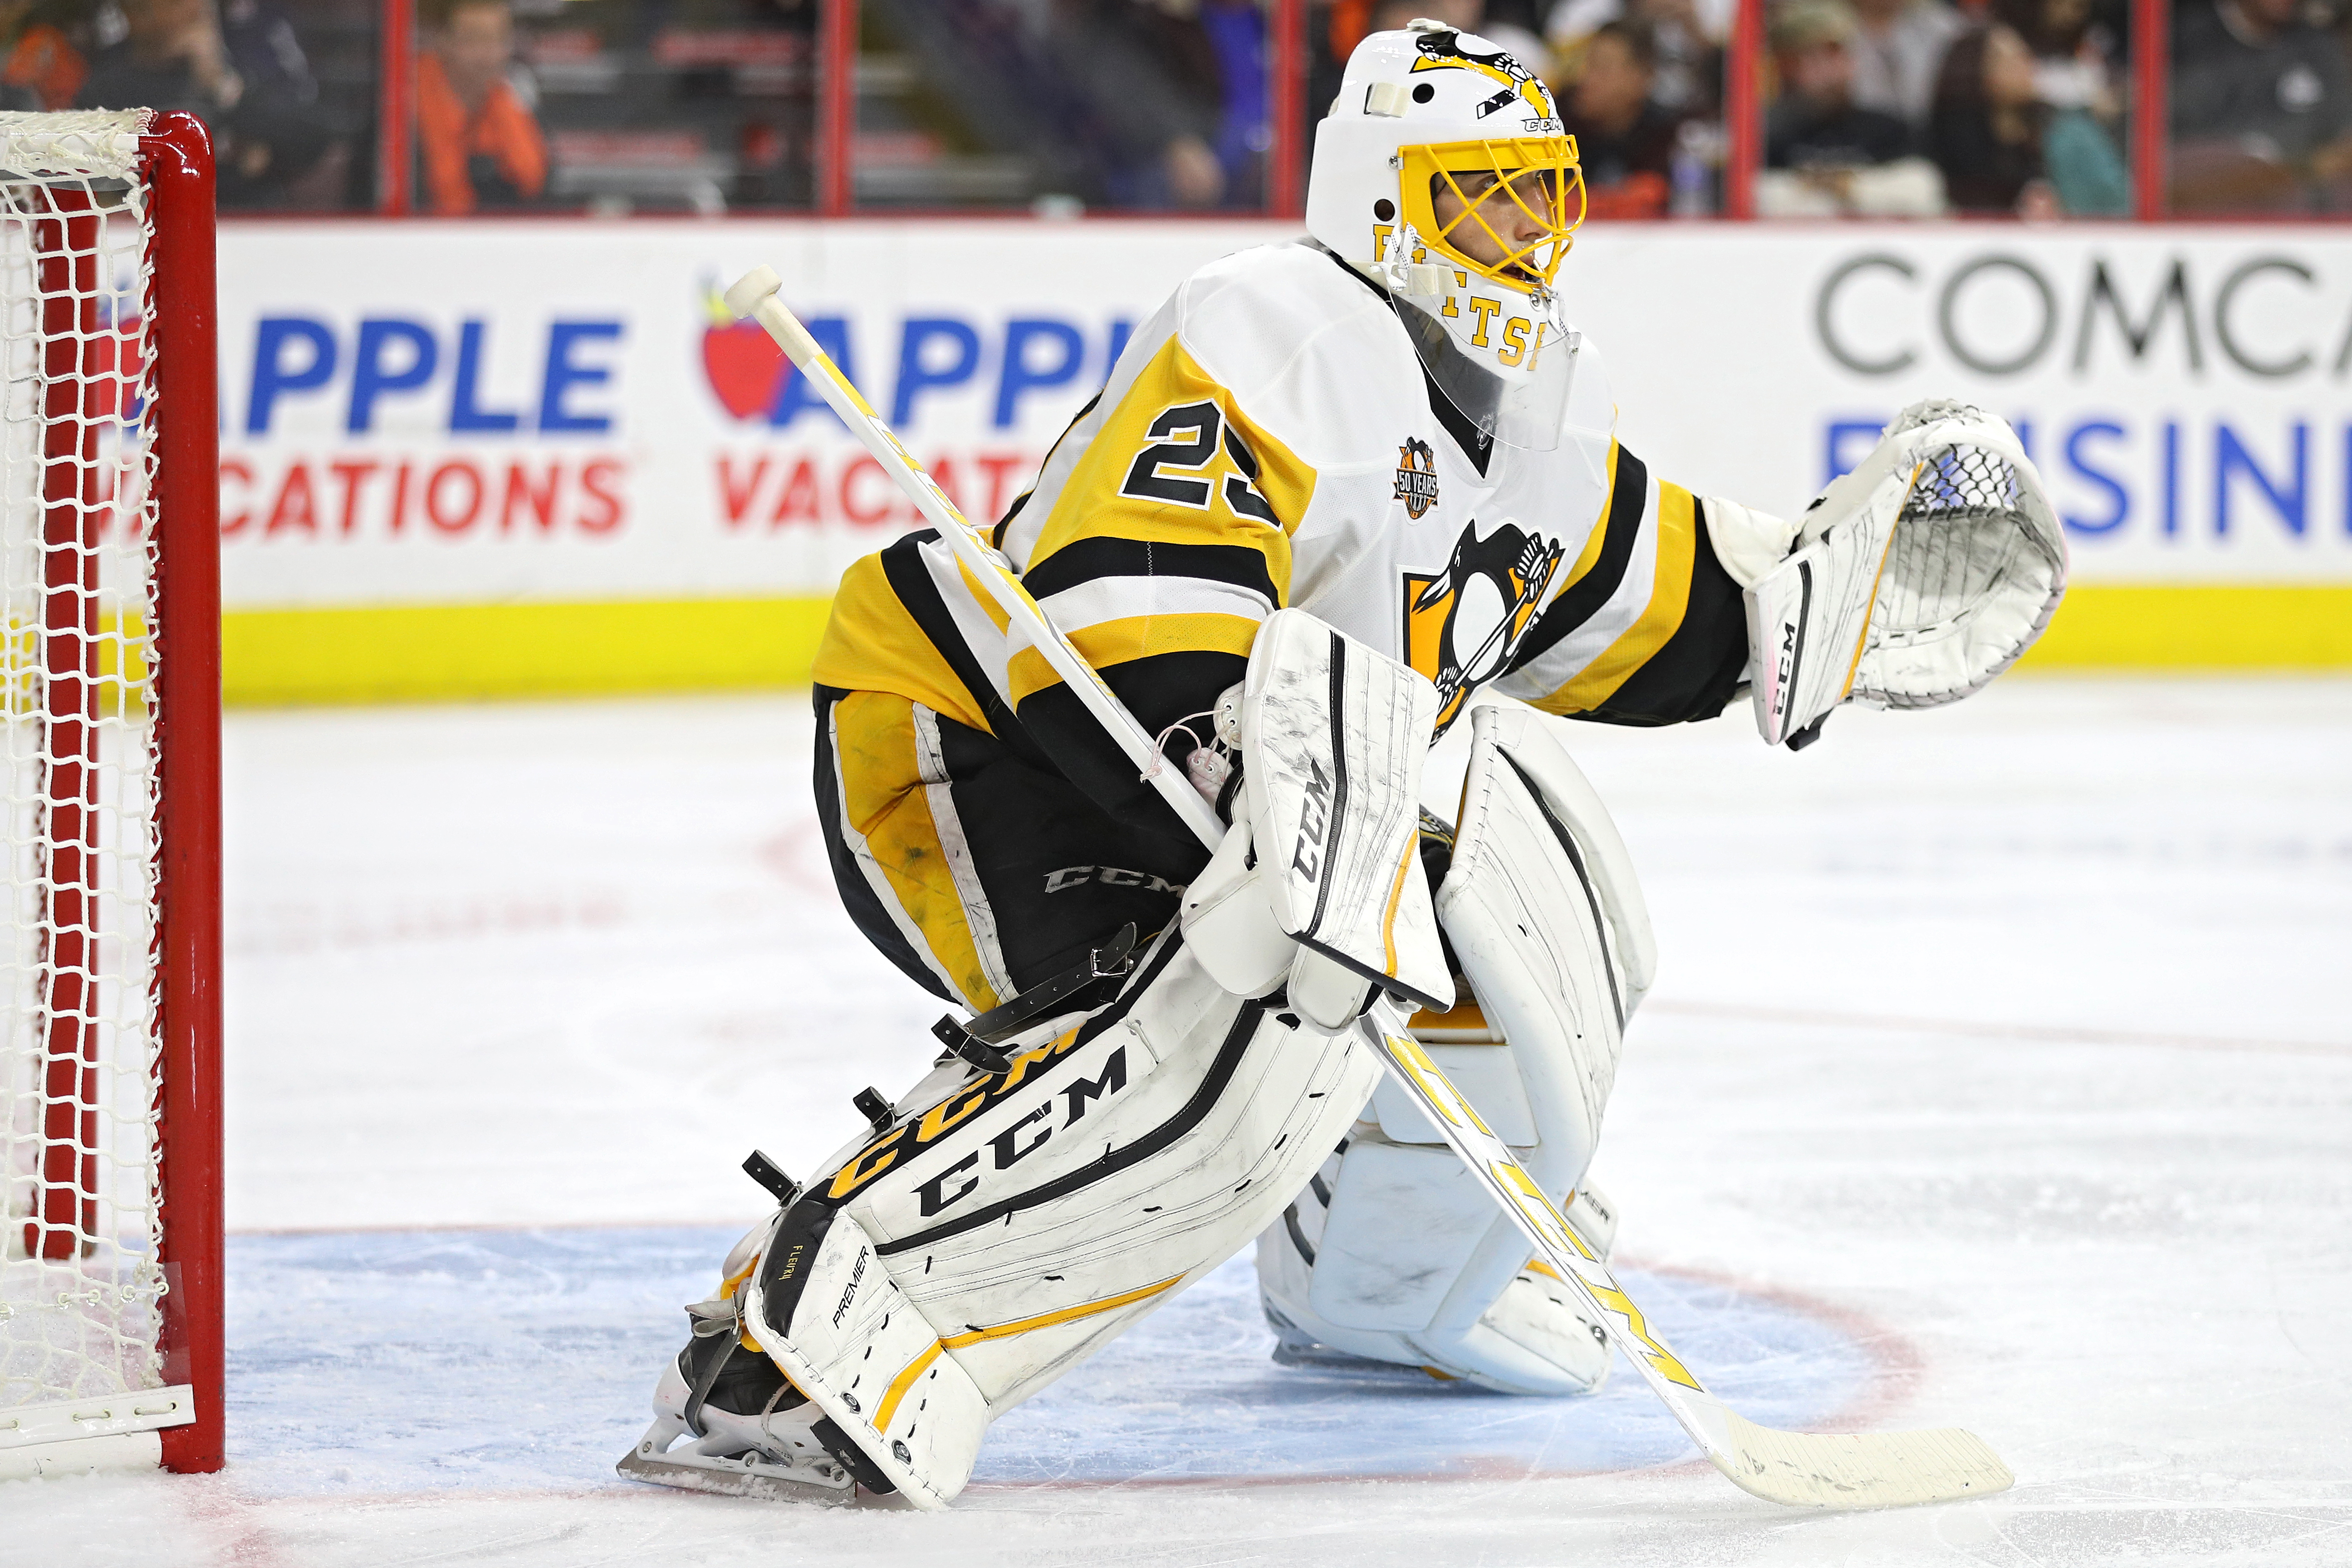 How Do The Penguins Play In Front of Each Goaltender?